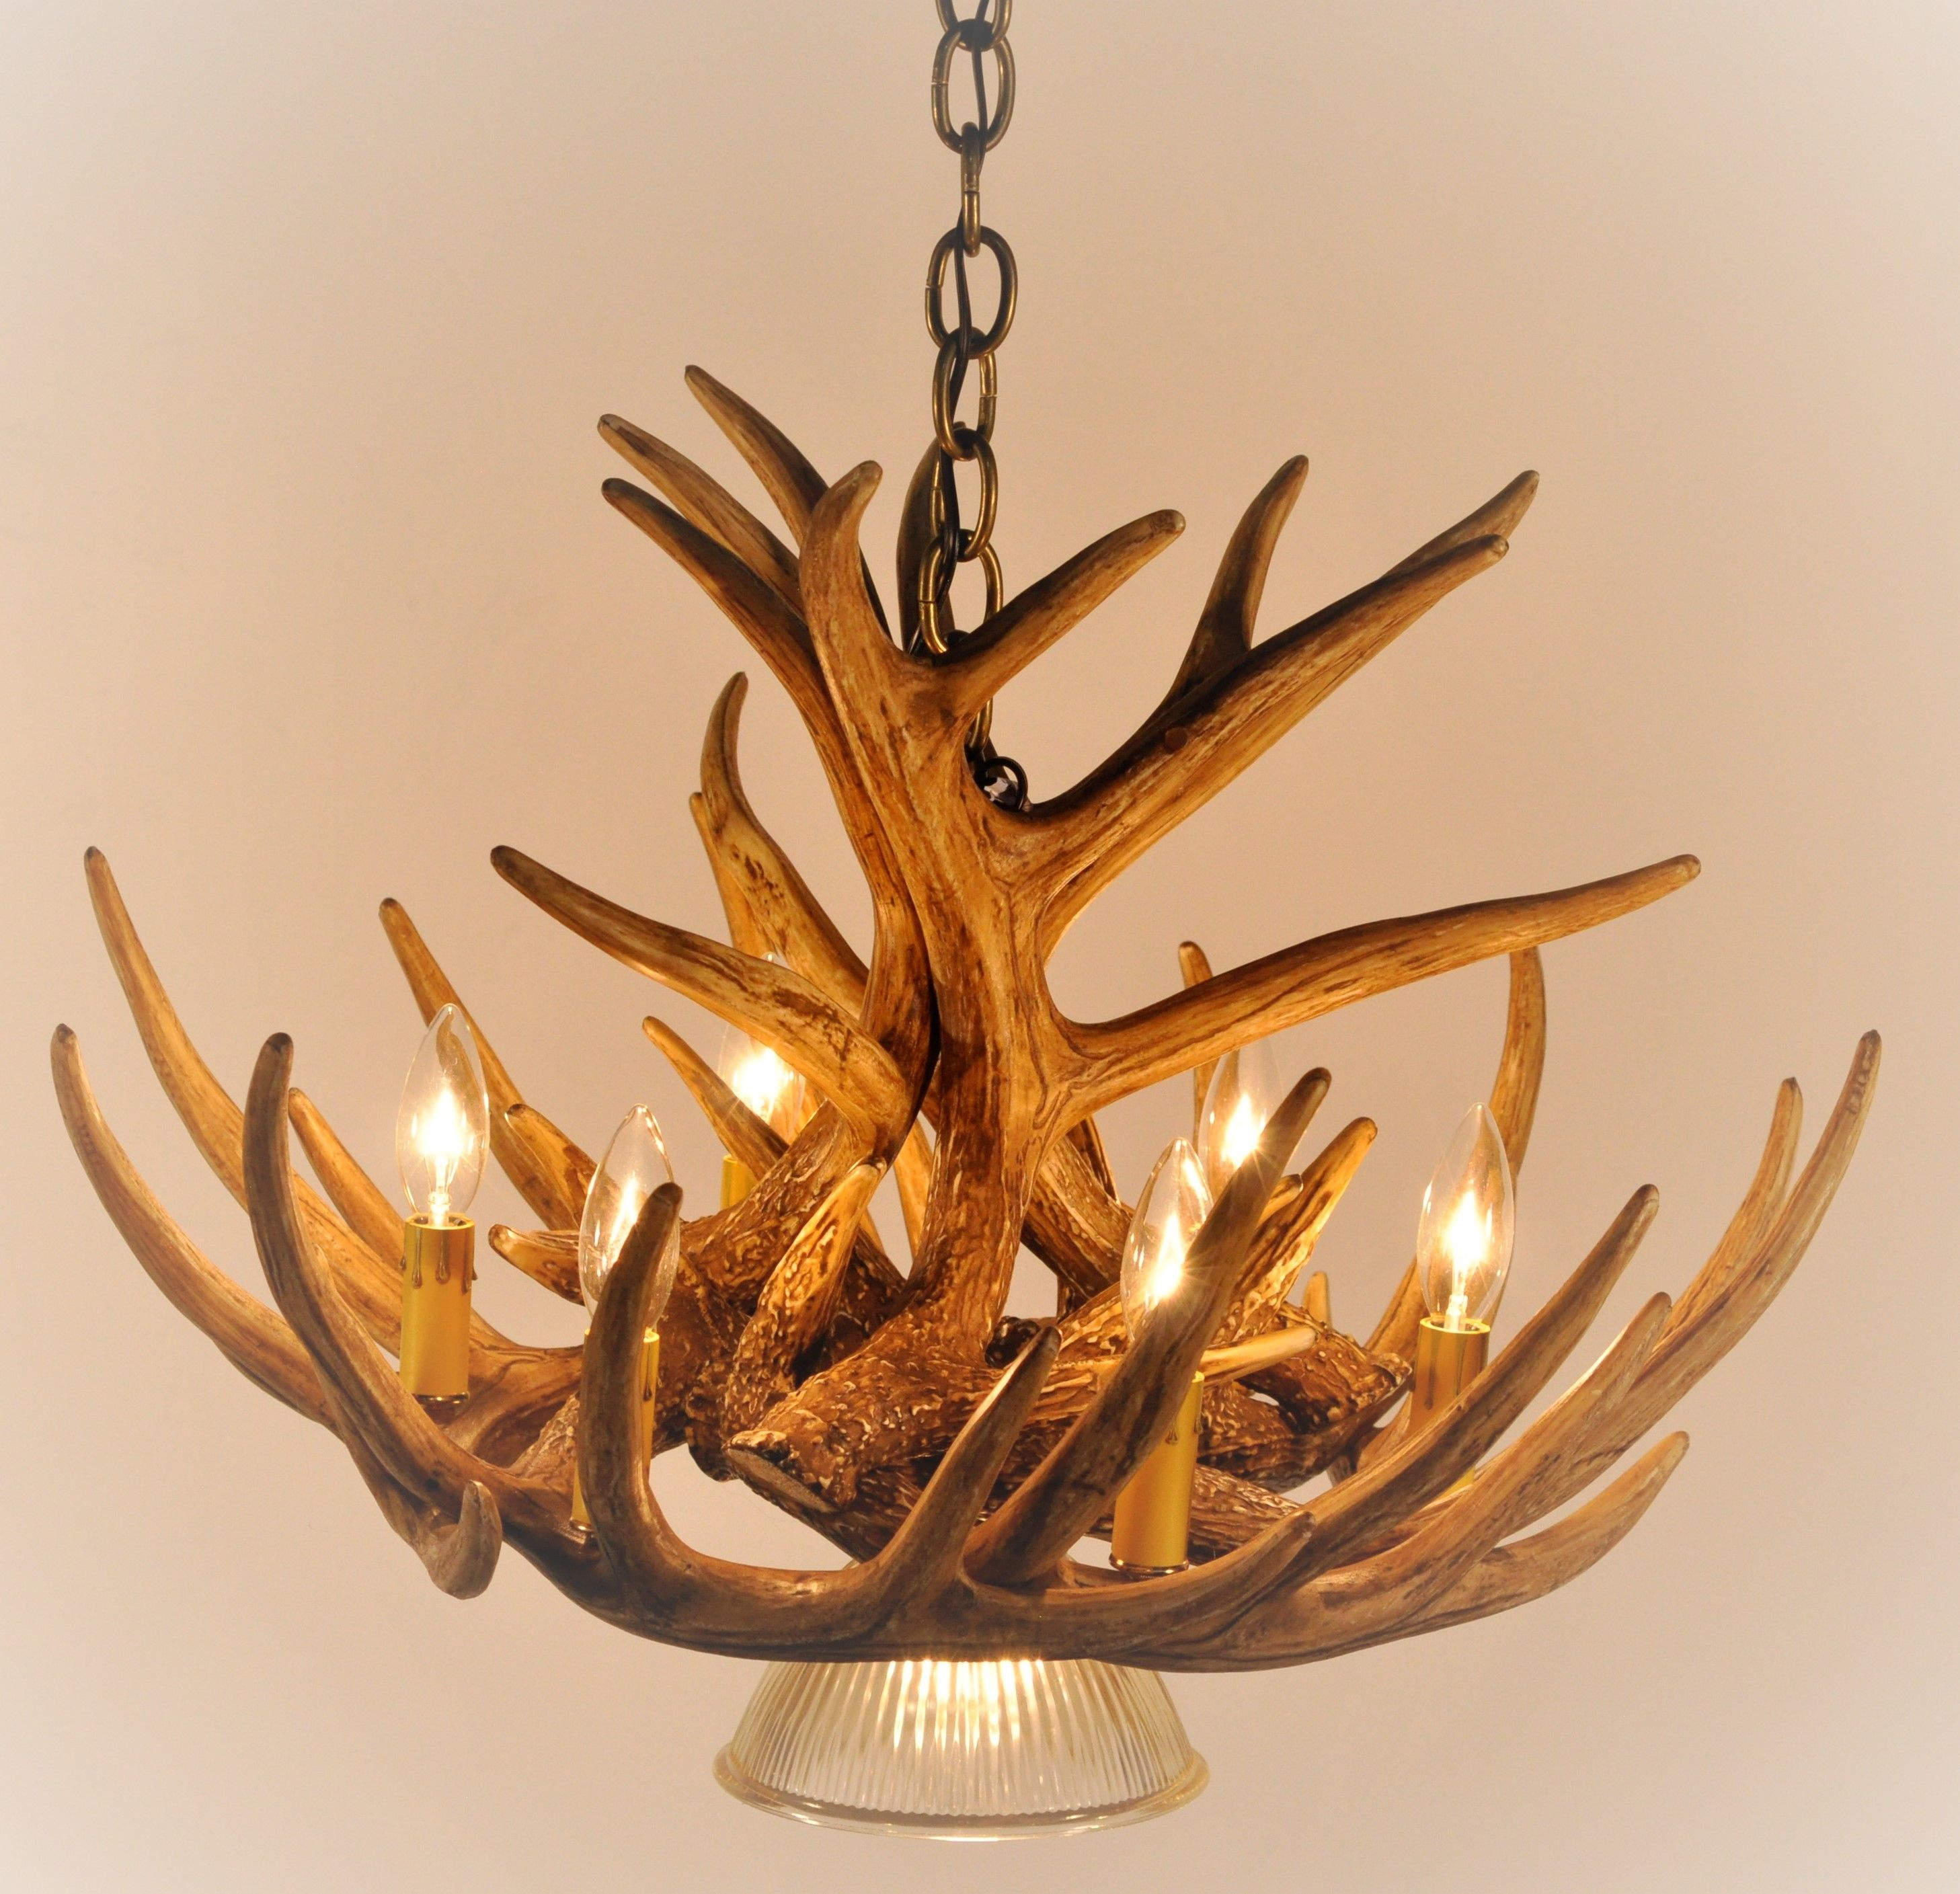 Deer antler ceiling lights httpcreativechairsandtables deer antler ceiling lights aloadofball Choice Image